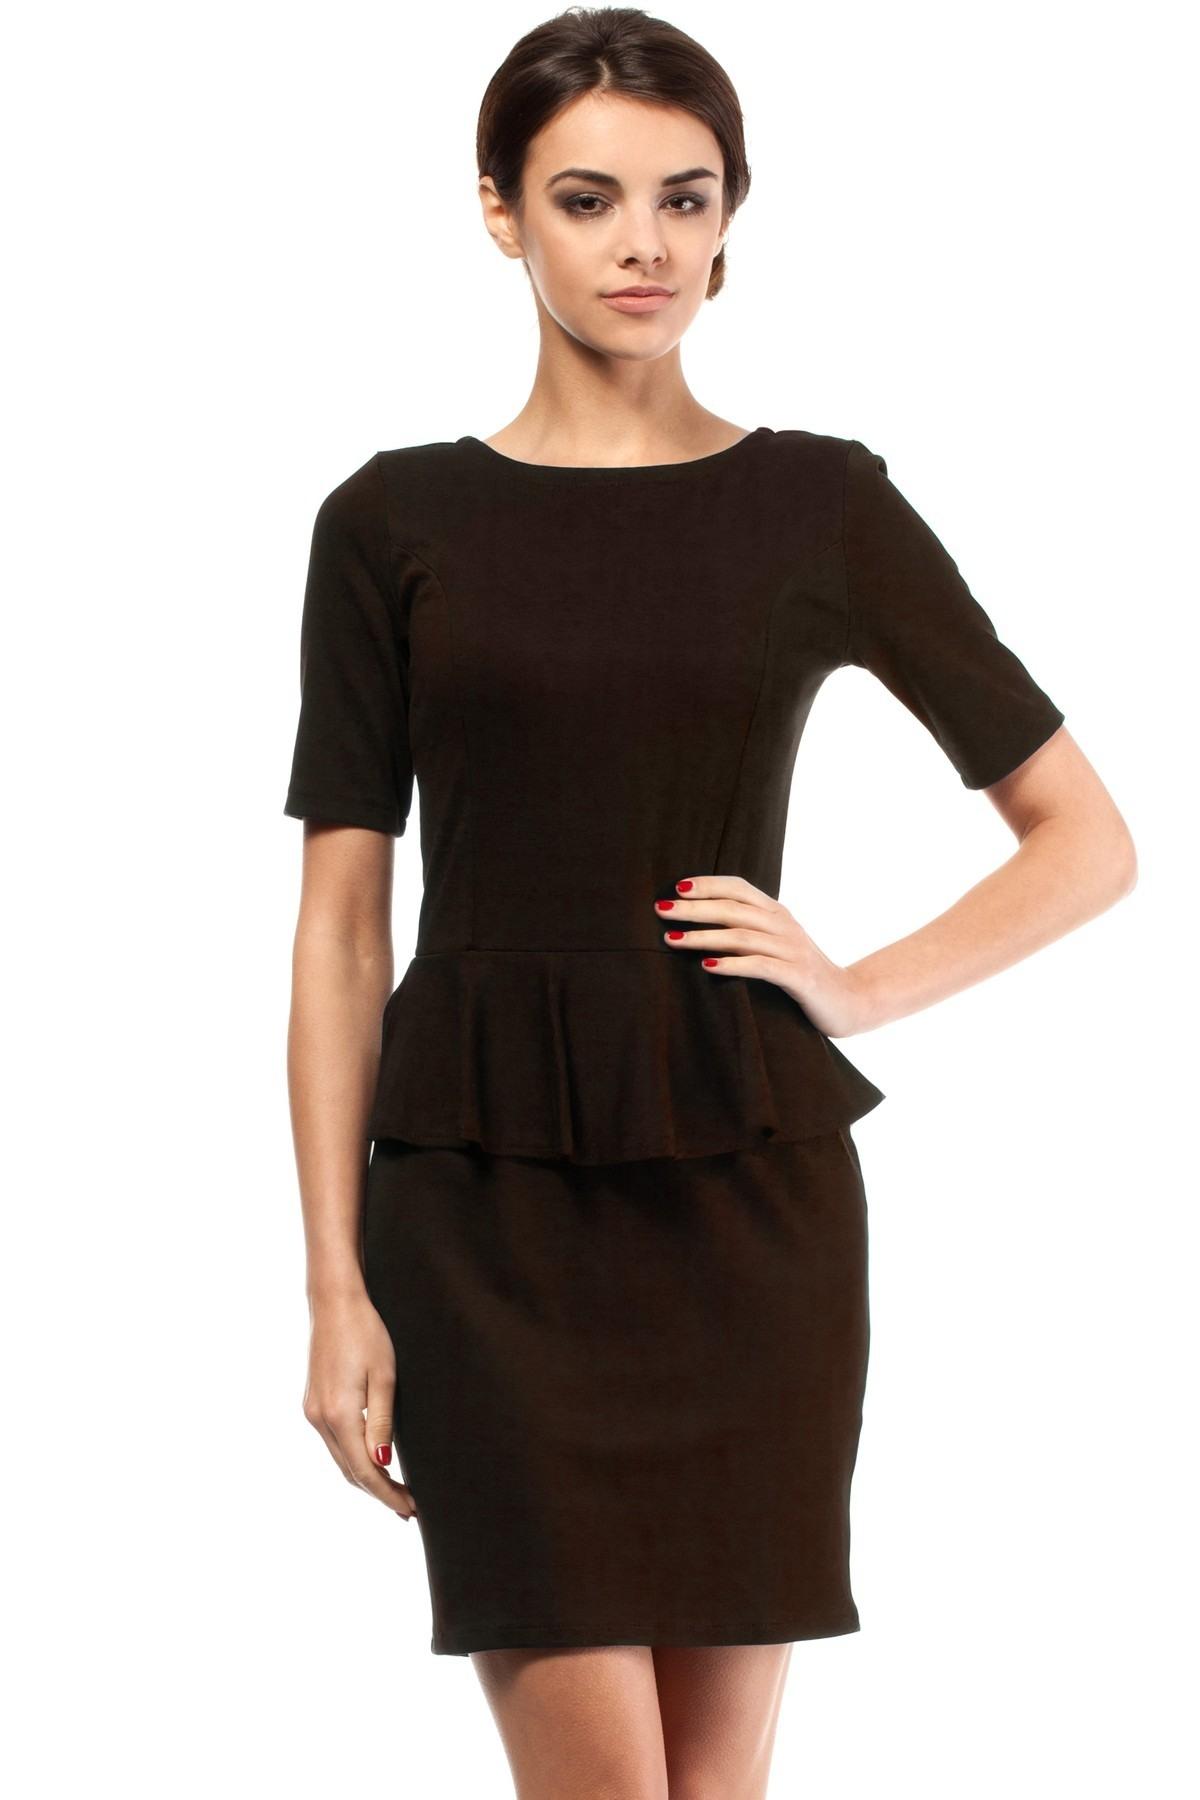 20 Spektakulär Kleid Eng Galerie Genial Kleid Eng Stylish